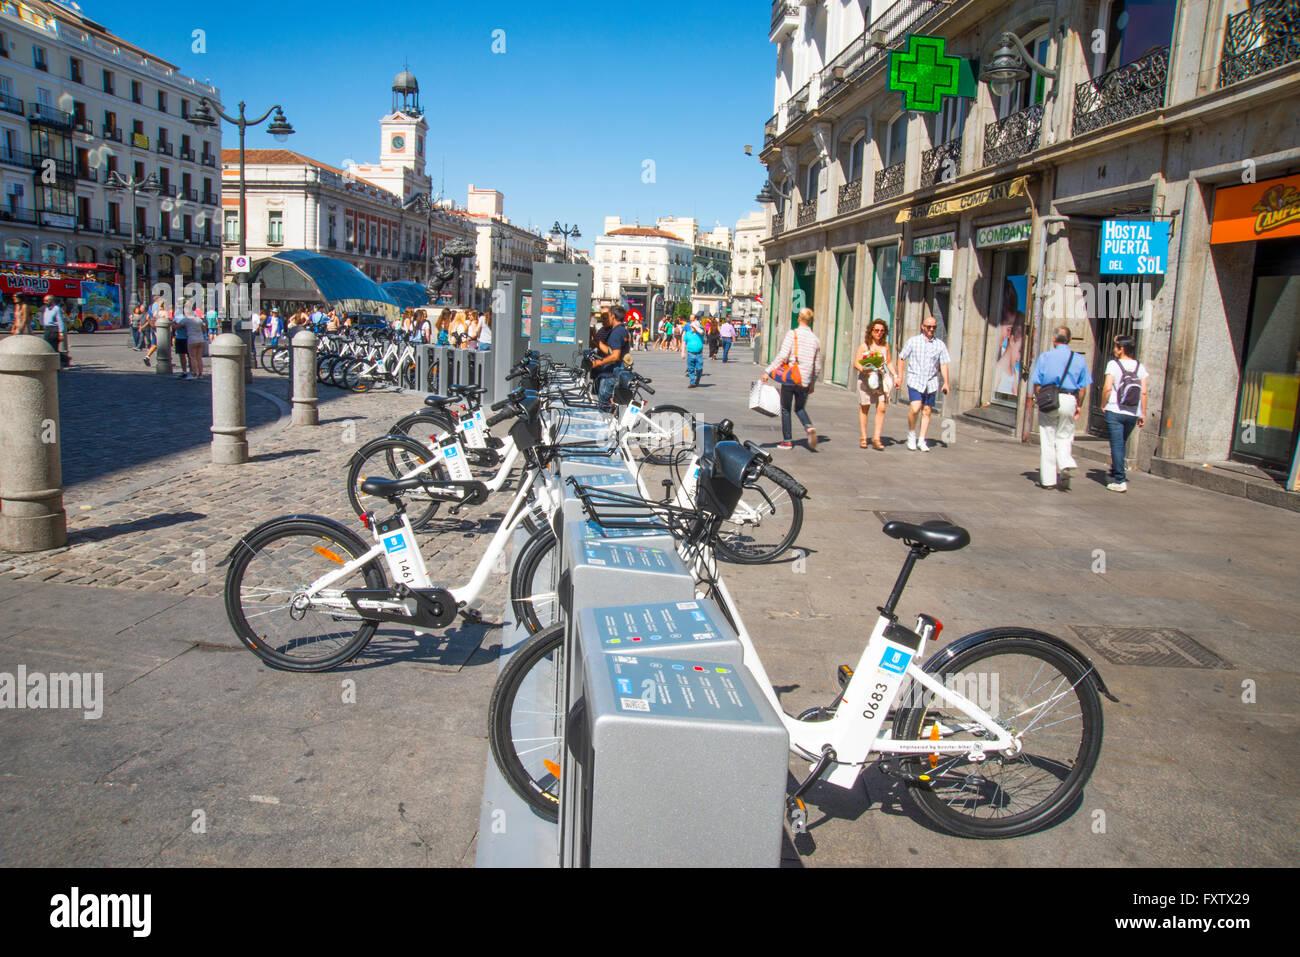 BiciMad bike parking. Puerta del Sol, Madrid, Spain. - Stock Image